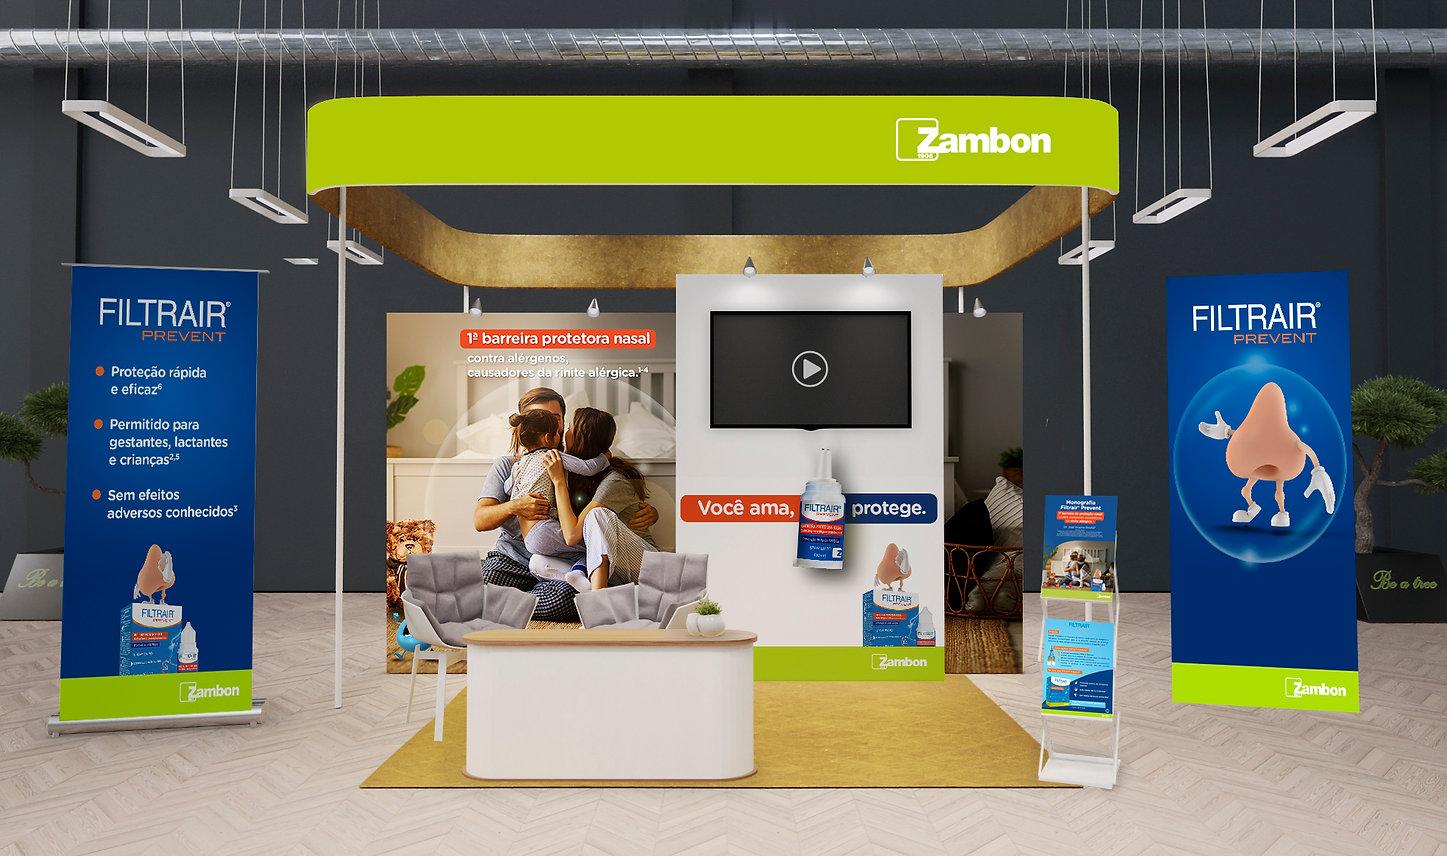 Zambon_stand_virtual_Filtrair_v2 (1).jpg